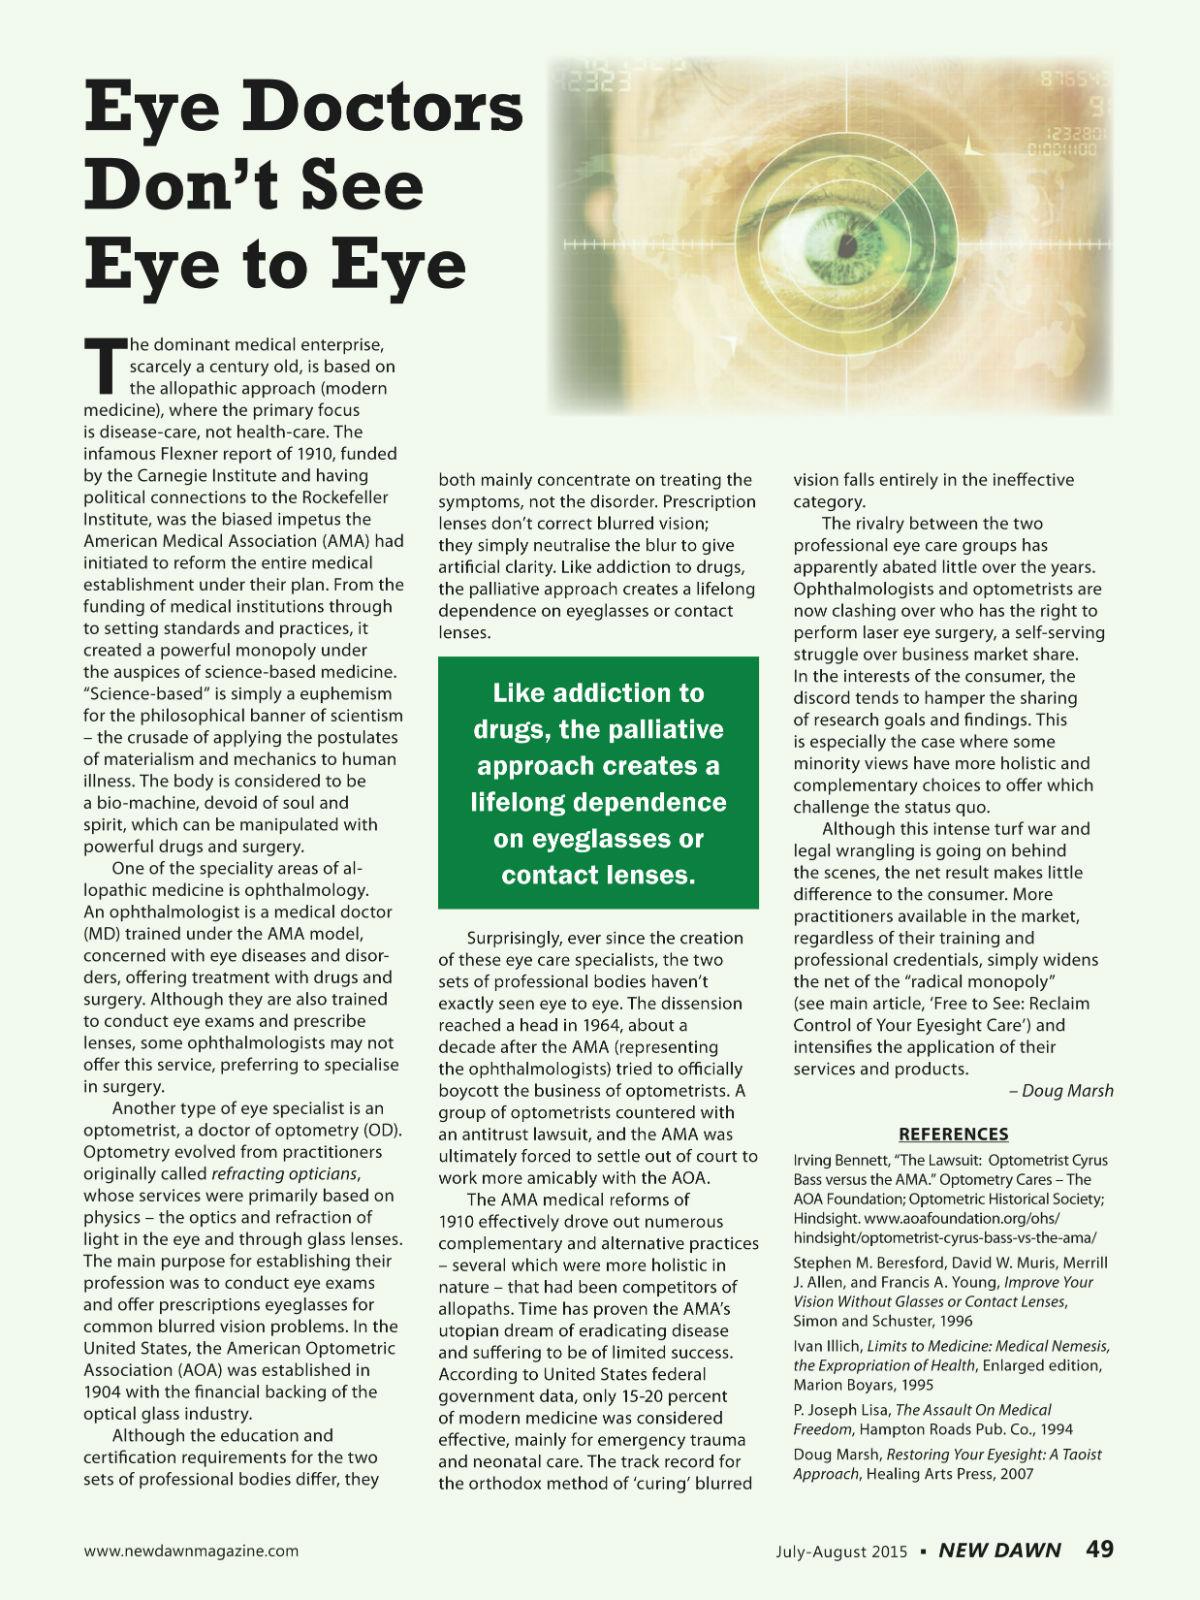 Eye Doctors Don't See Eye to Eye